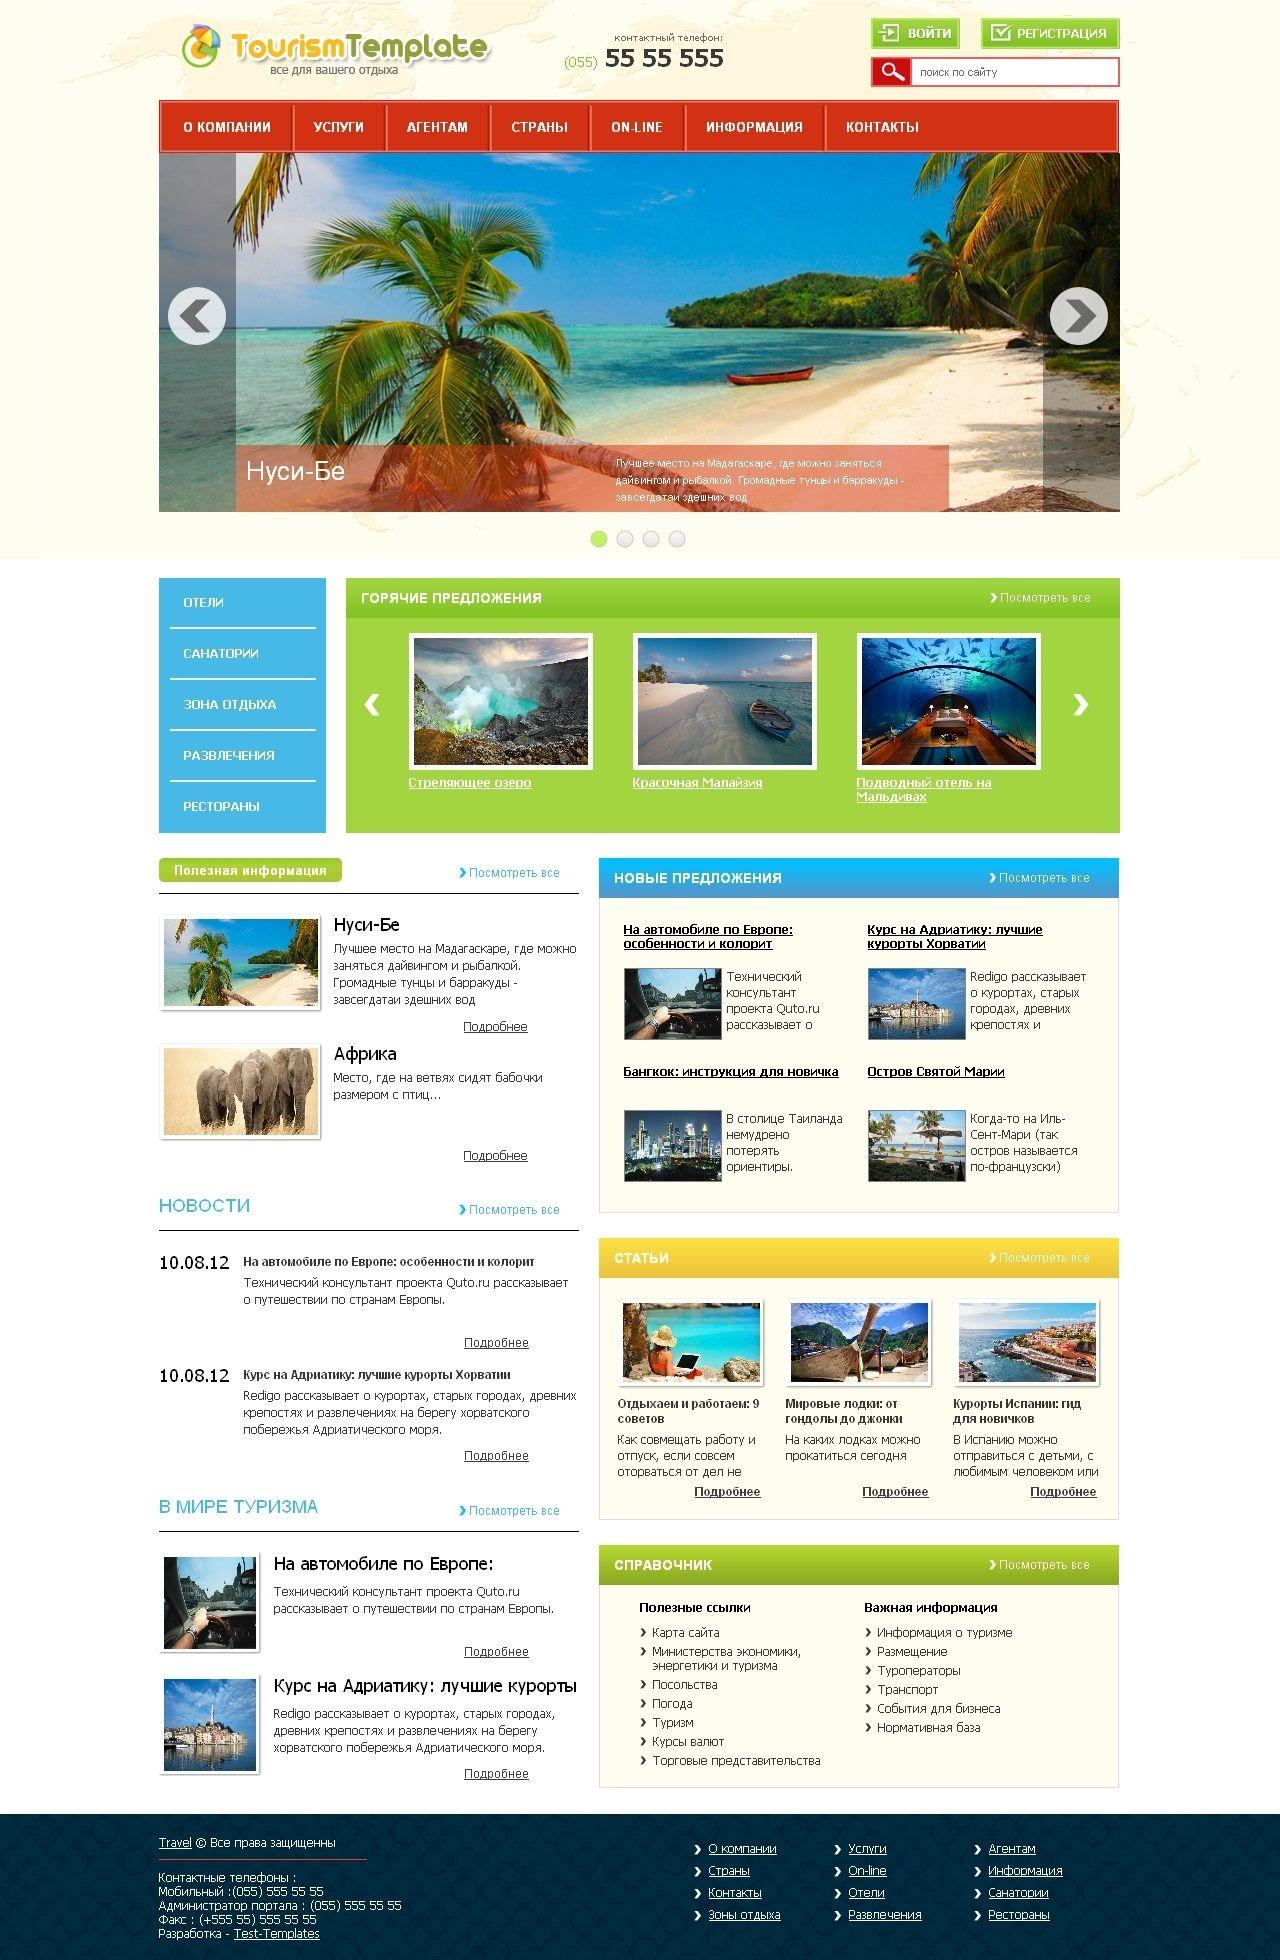 Tourism Template - красочный туристический шаблон для DLE | Template